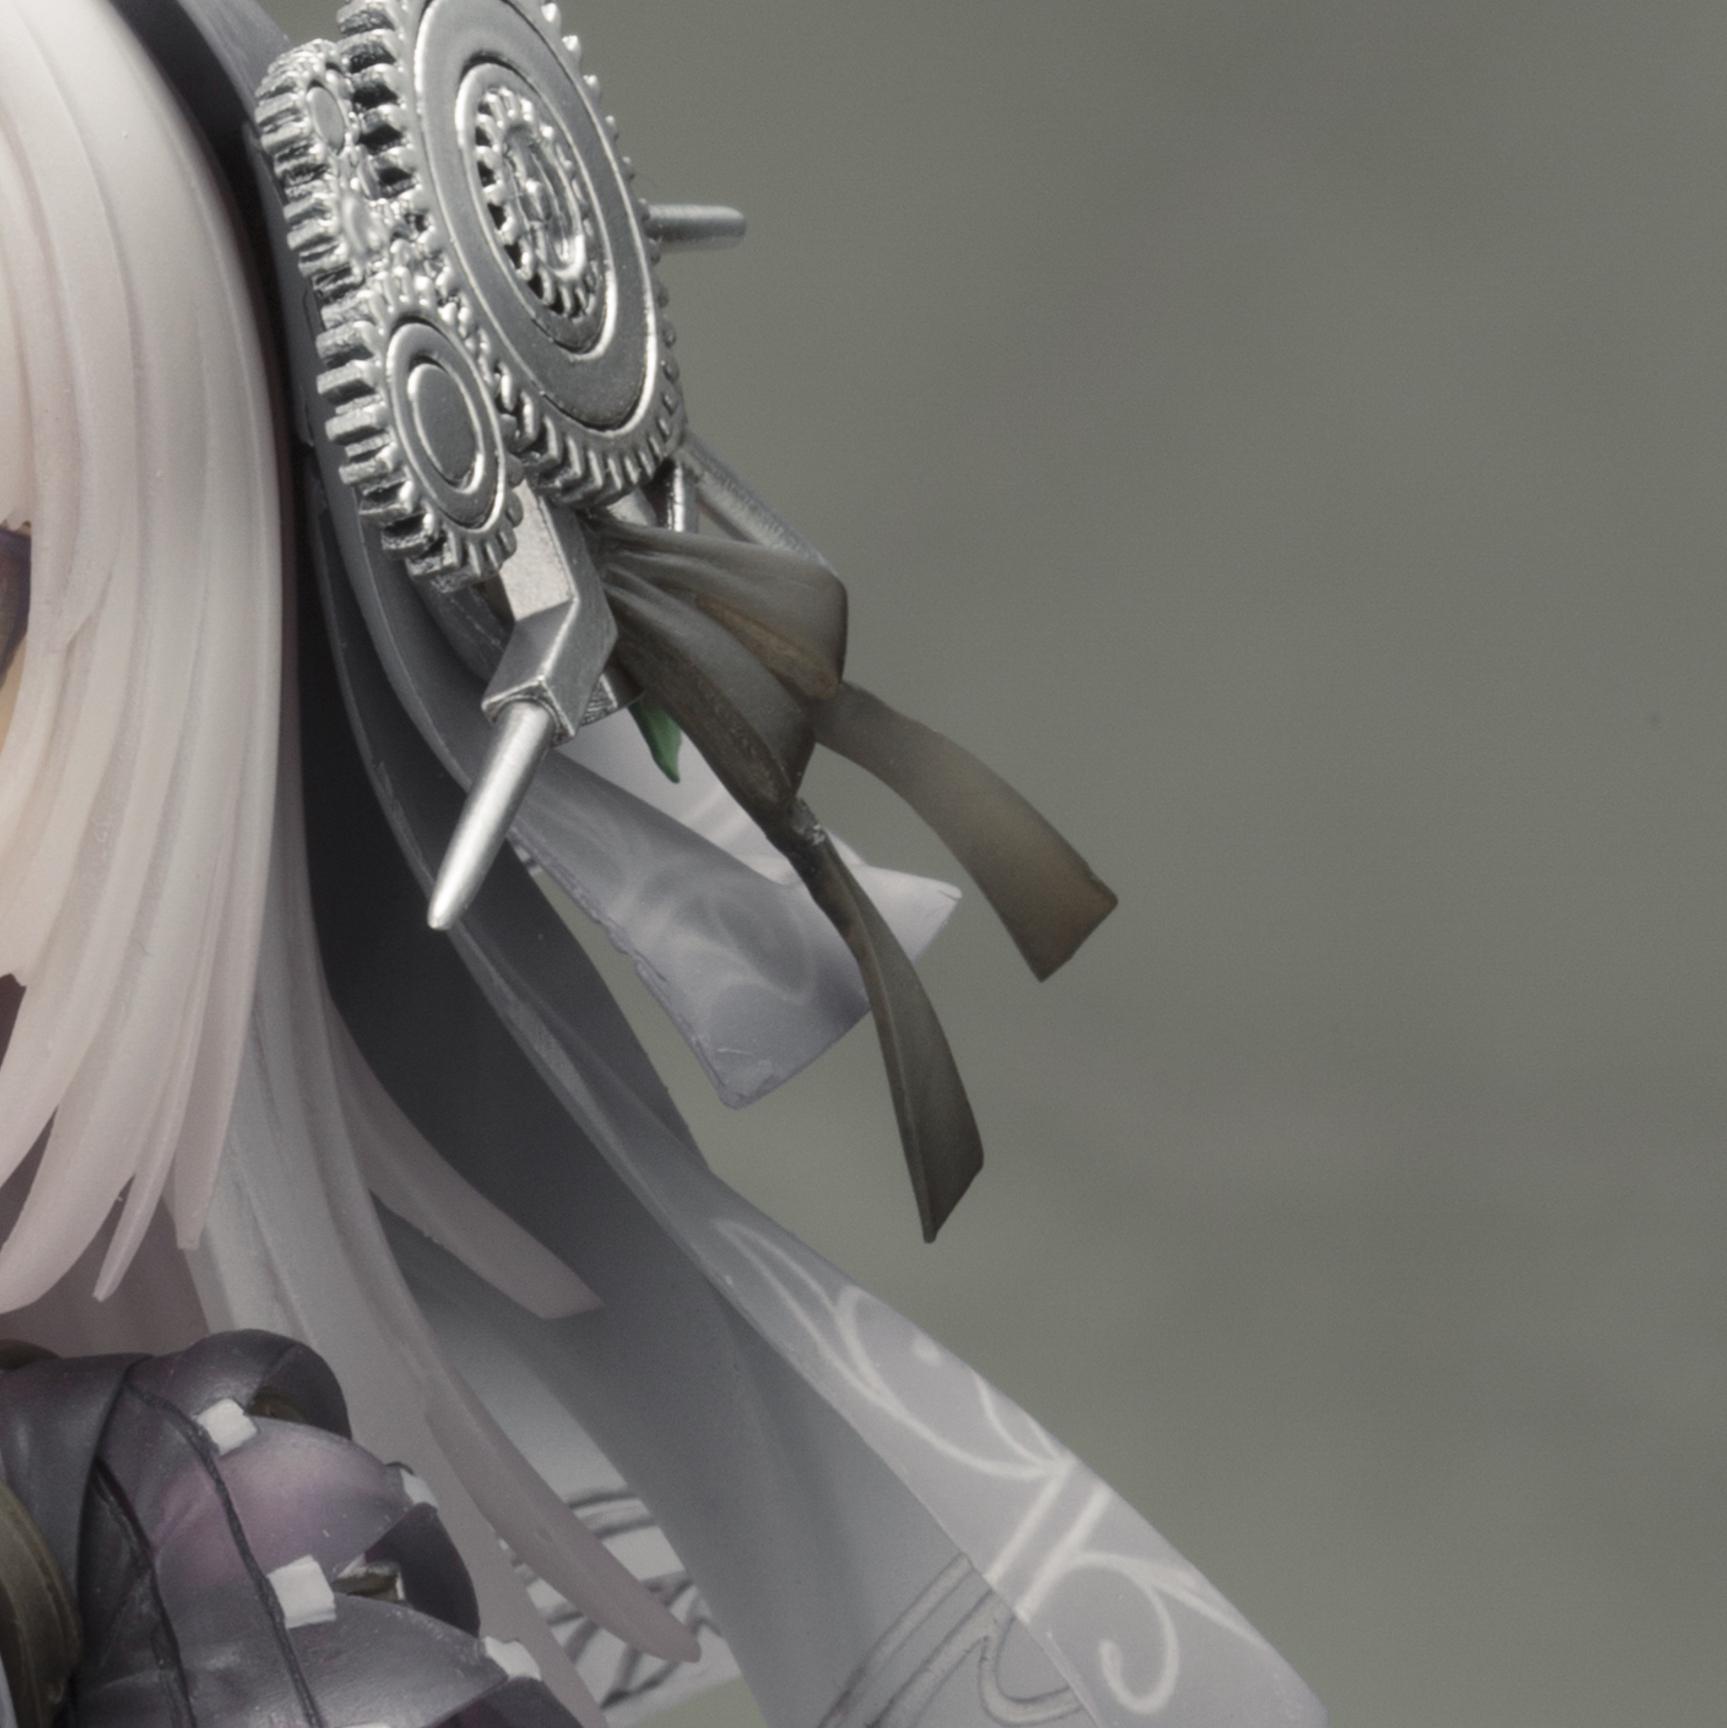 Link a kotobukiya-wf2017w-teaser-02